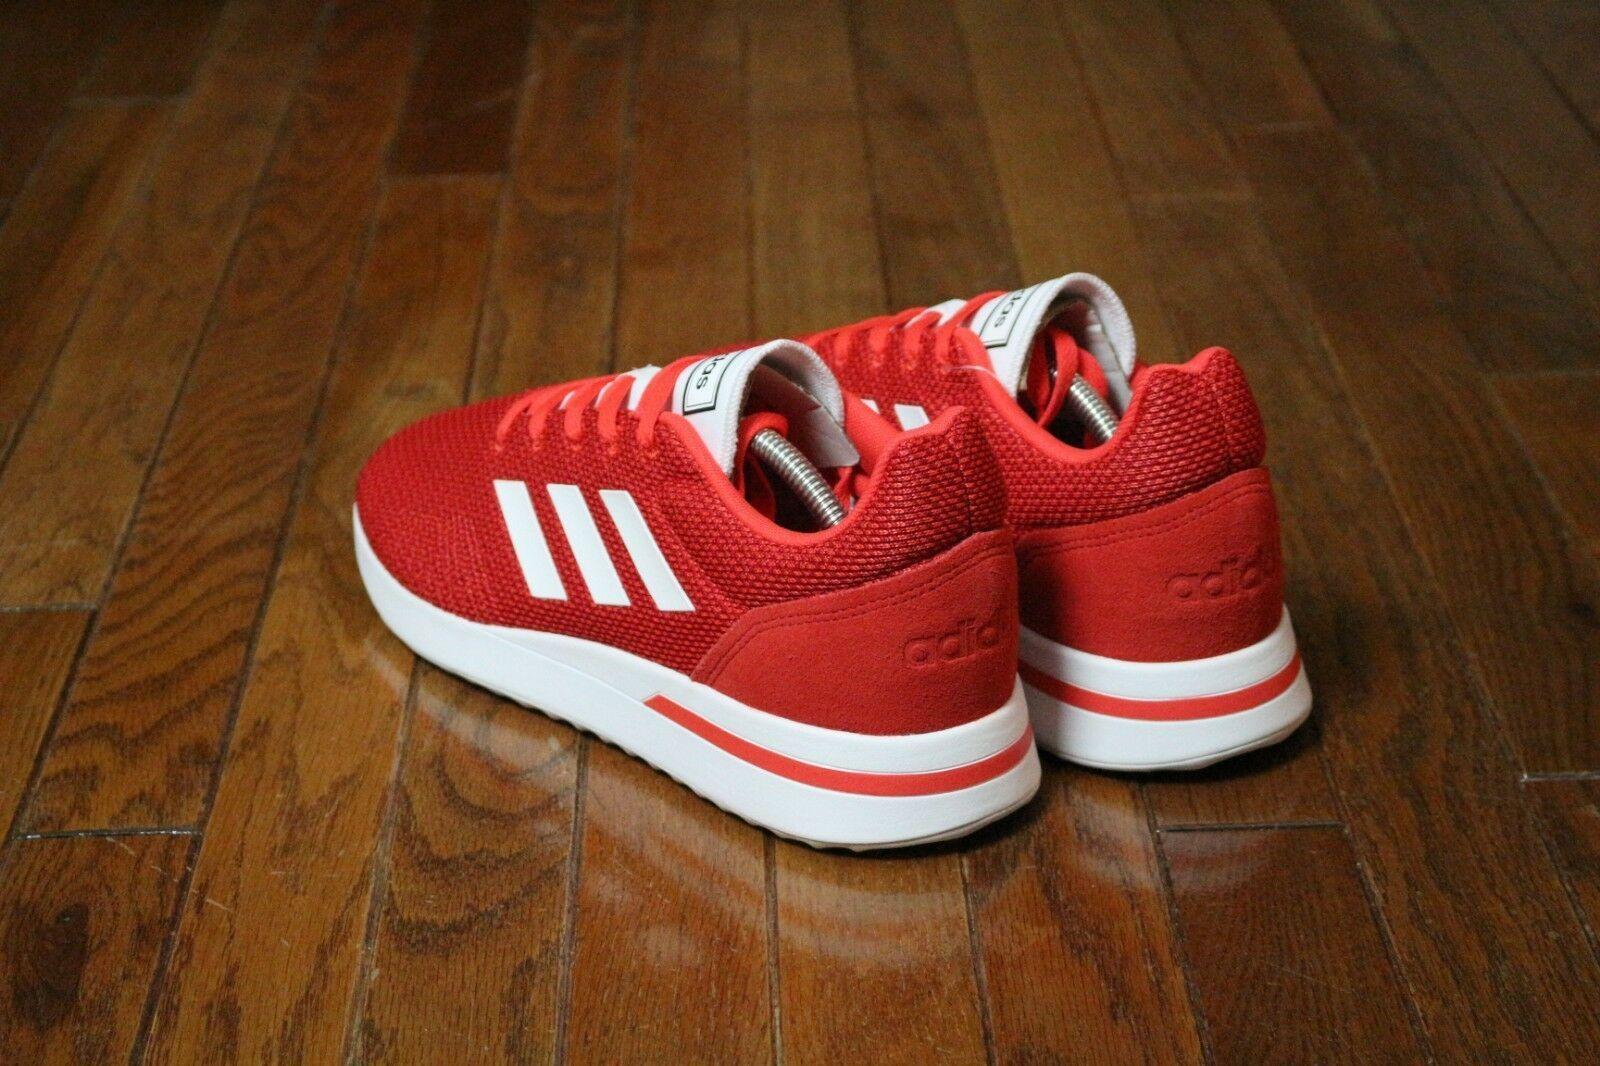 Adidas Men's Size 10.5 Essentials Run70s Running Shoe B96556 Red